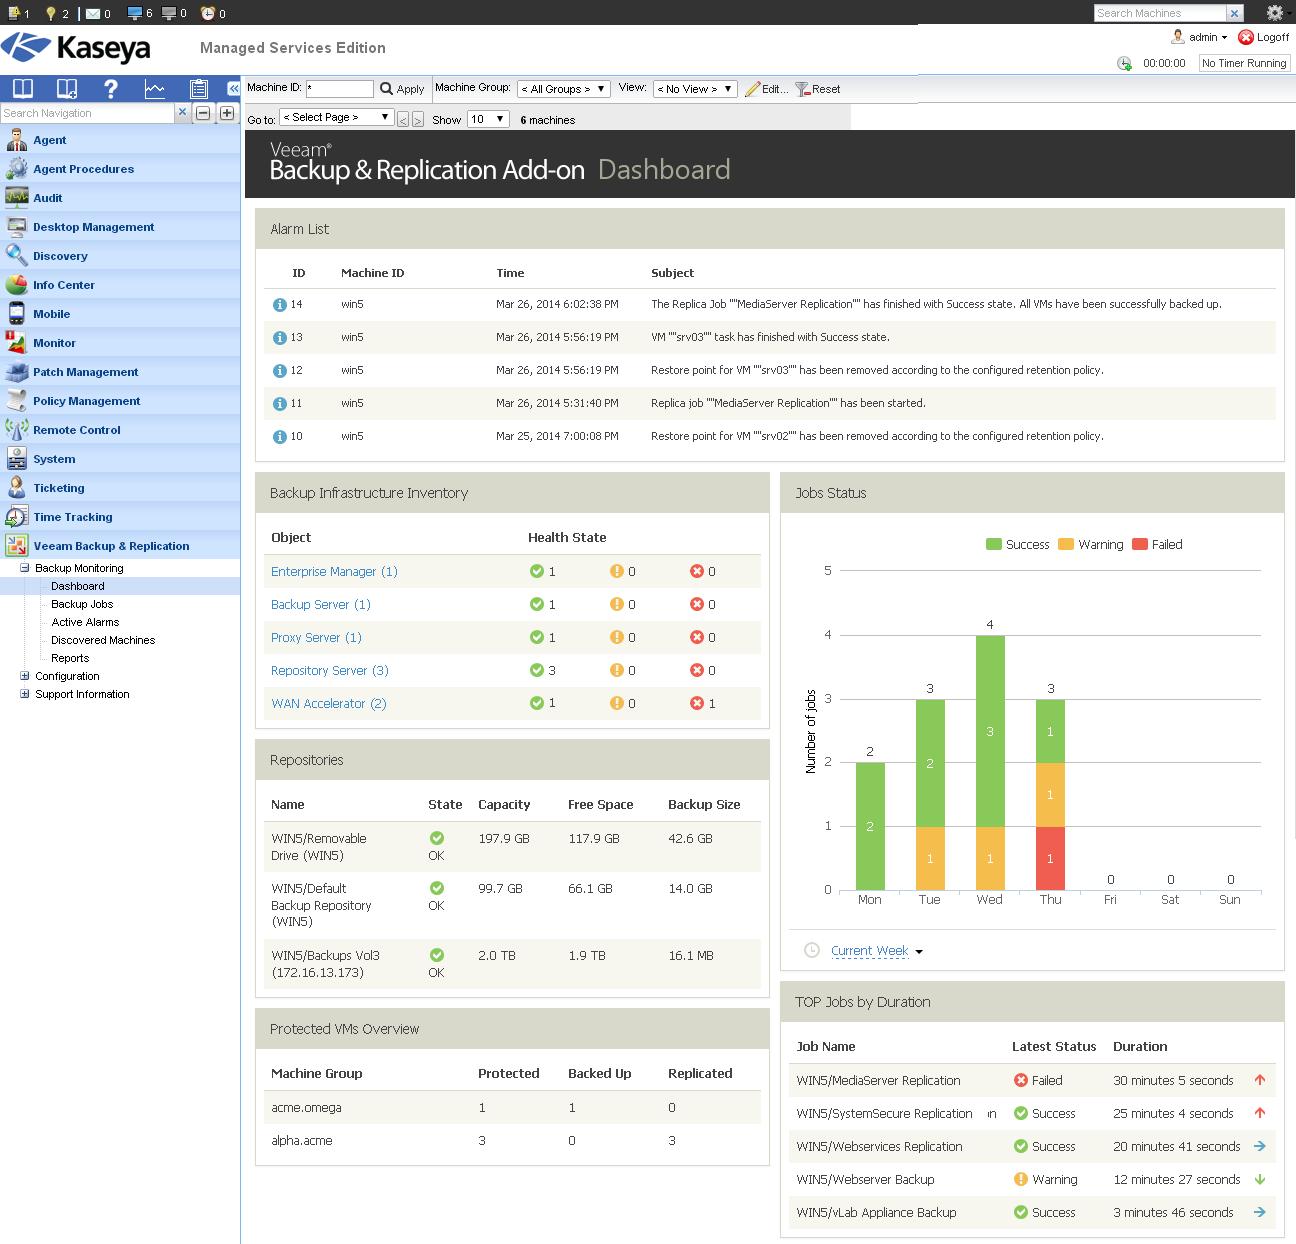 Veeam Backup & Replication Add-on for Kaseya - Backup Monitoring Dashboard